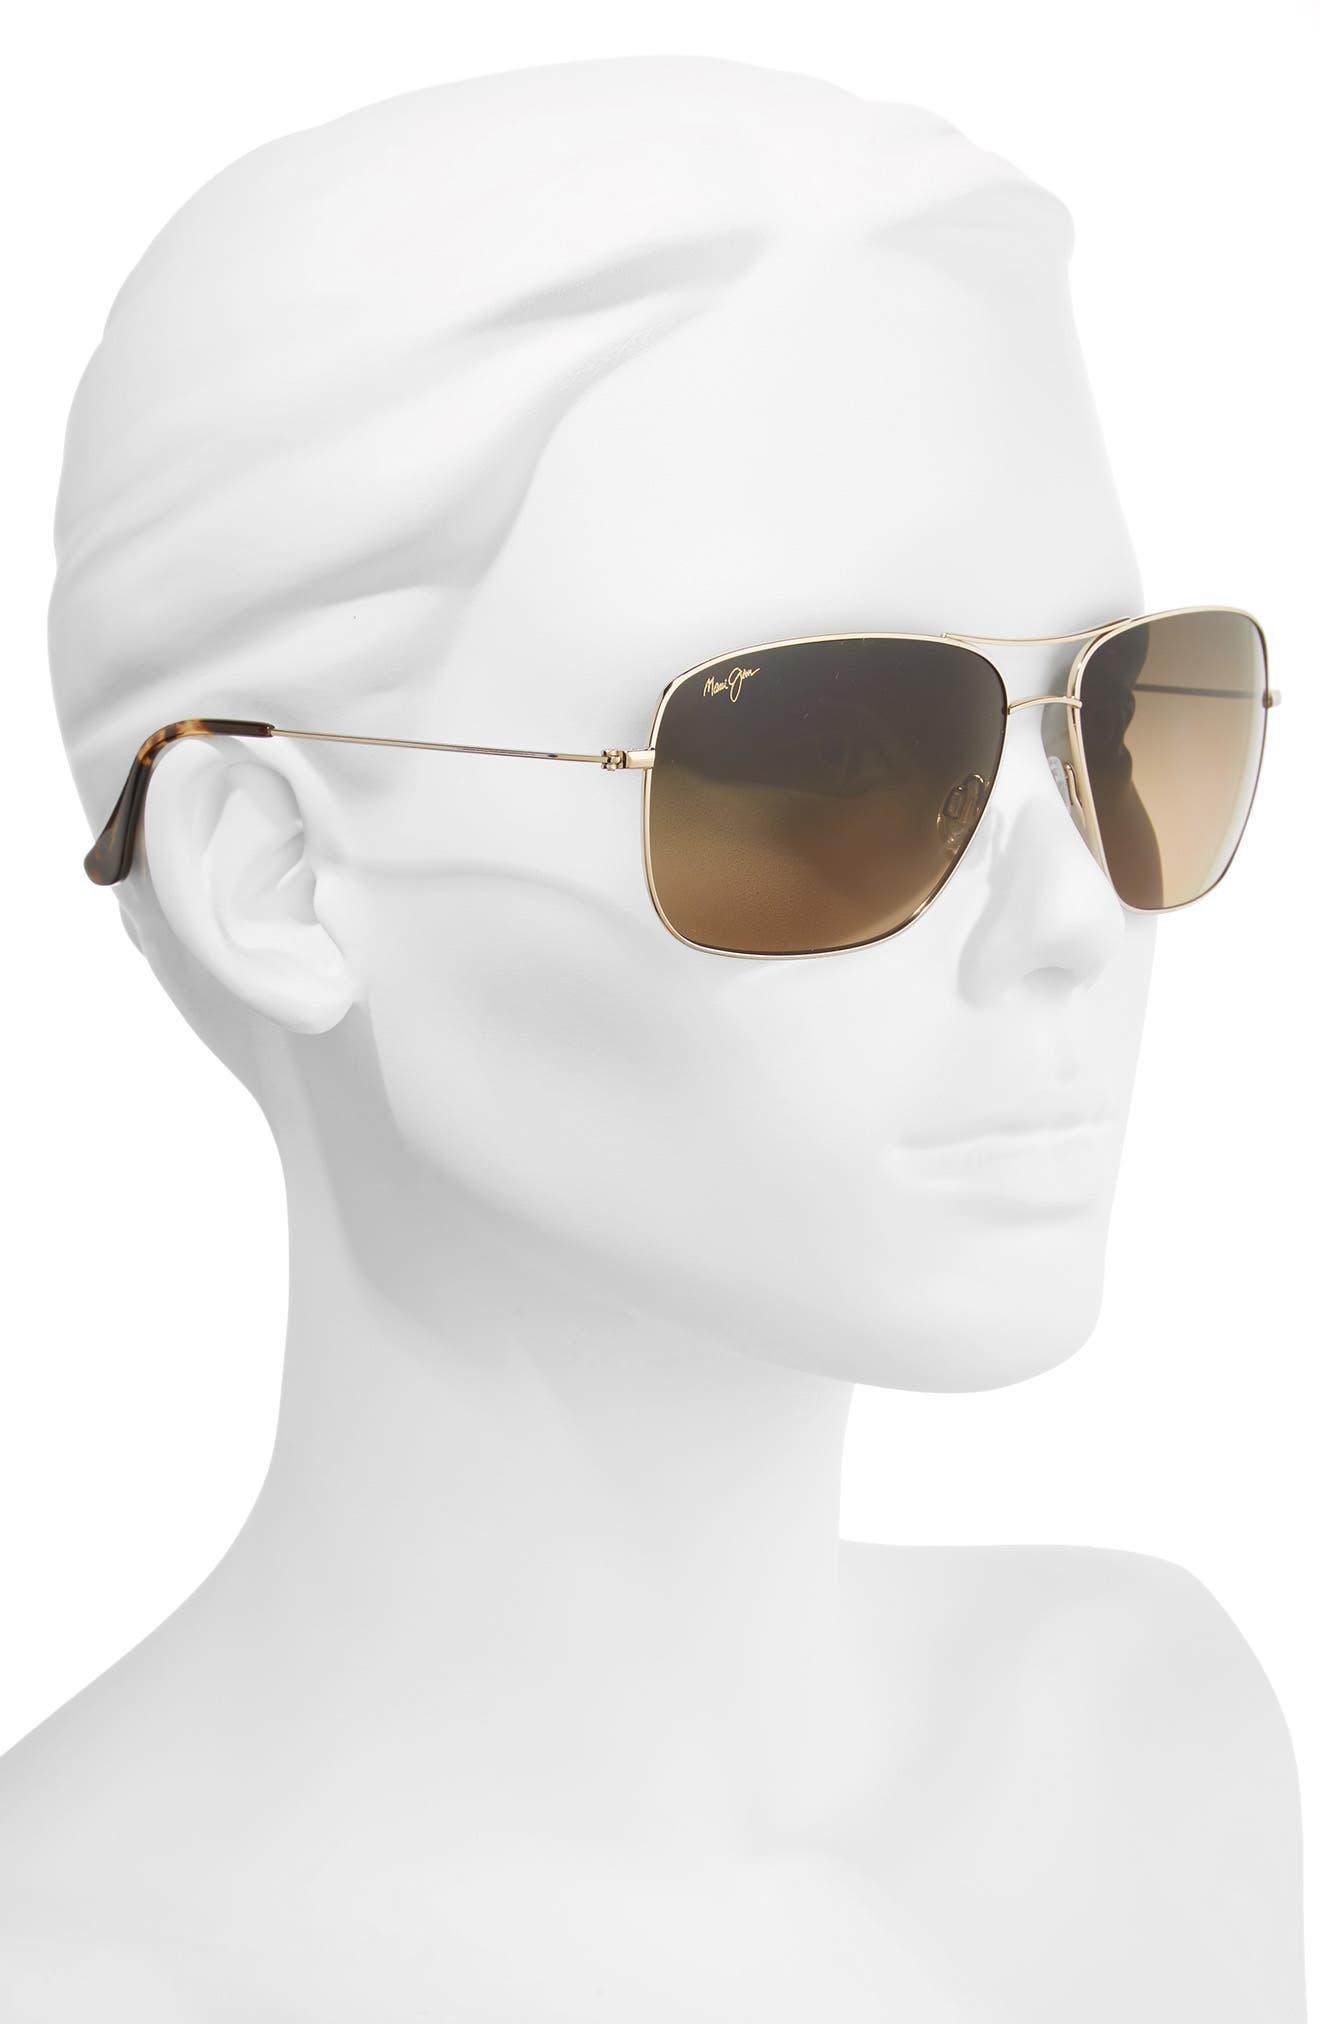 Cook Pines 63mm Polarized Titanium Aviator Sunglasses,                             Alternate thumbnail 8, color,